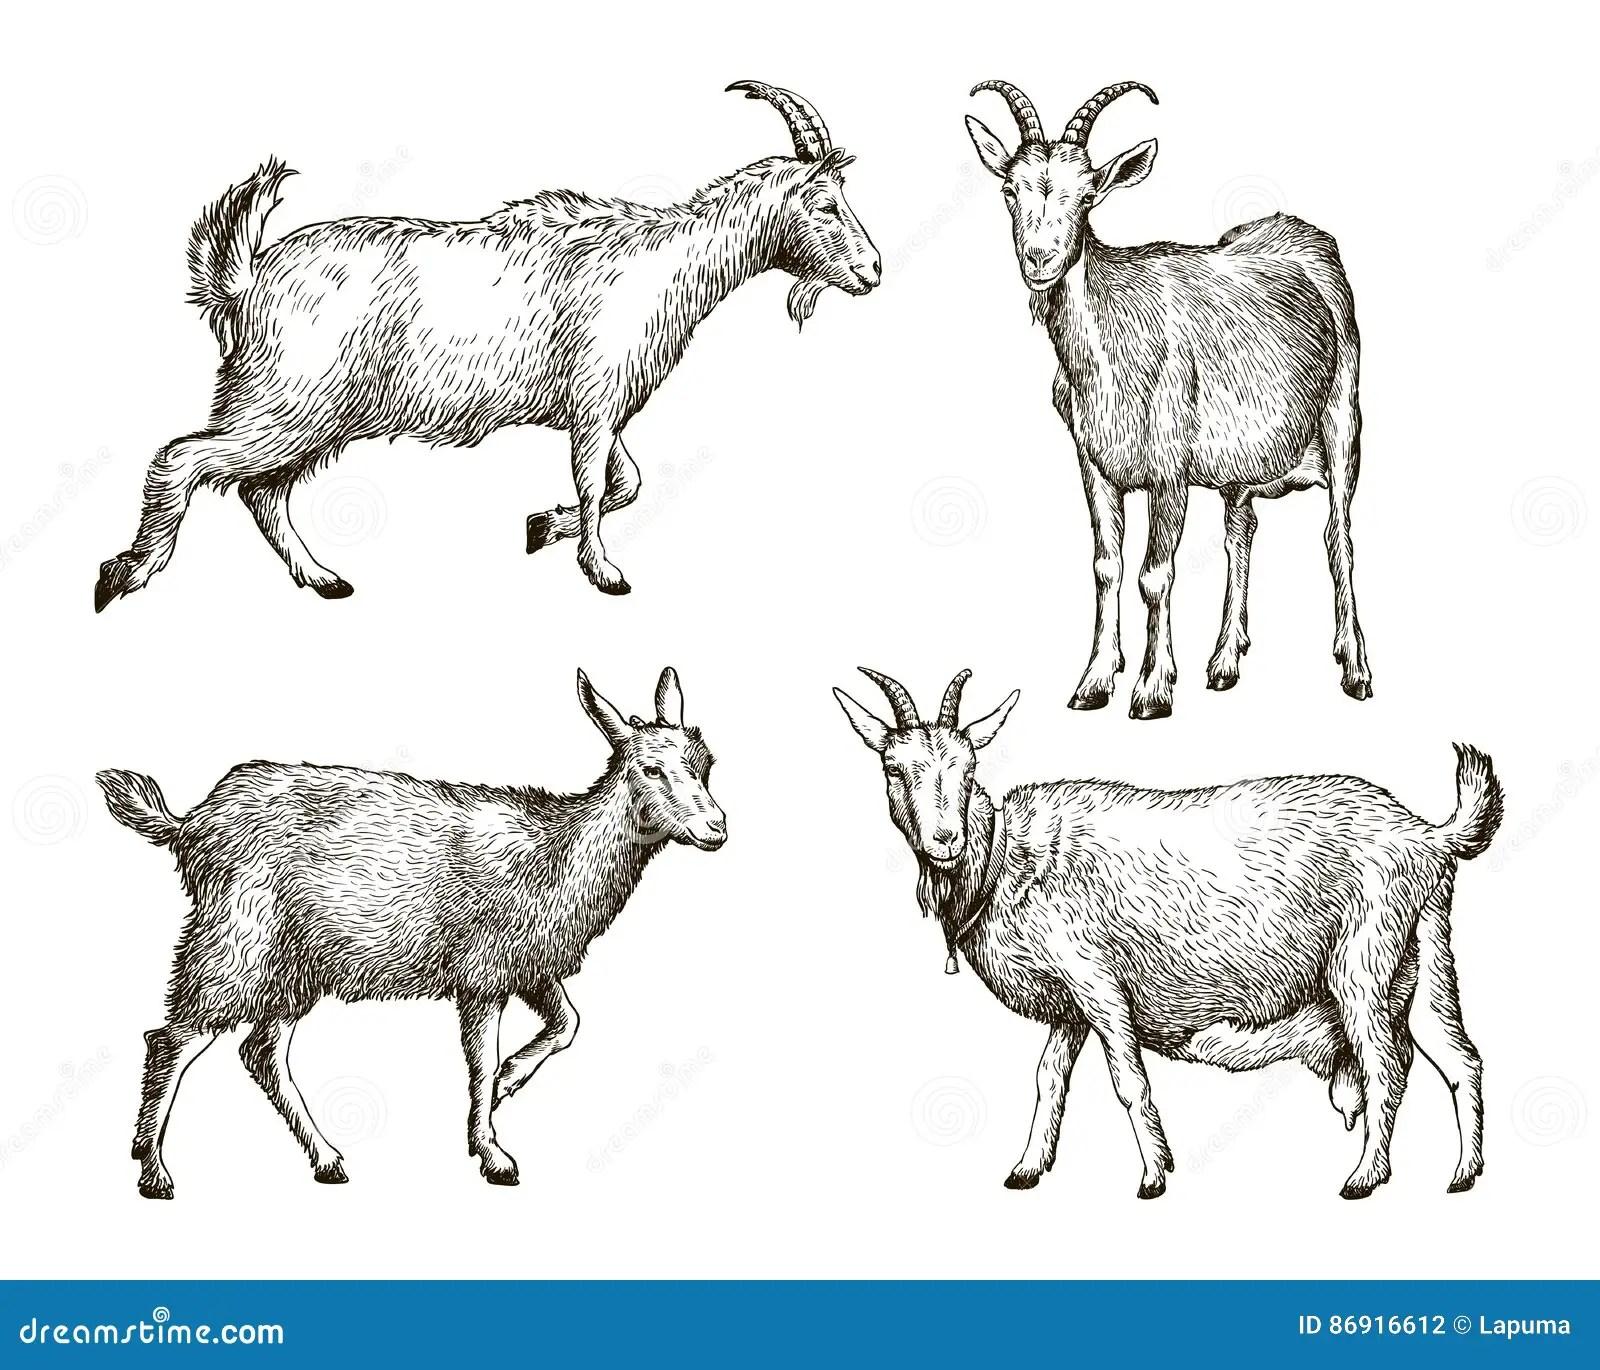 Livestock Cartoons Illustrations Amp Vector Stock Images